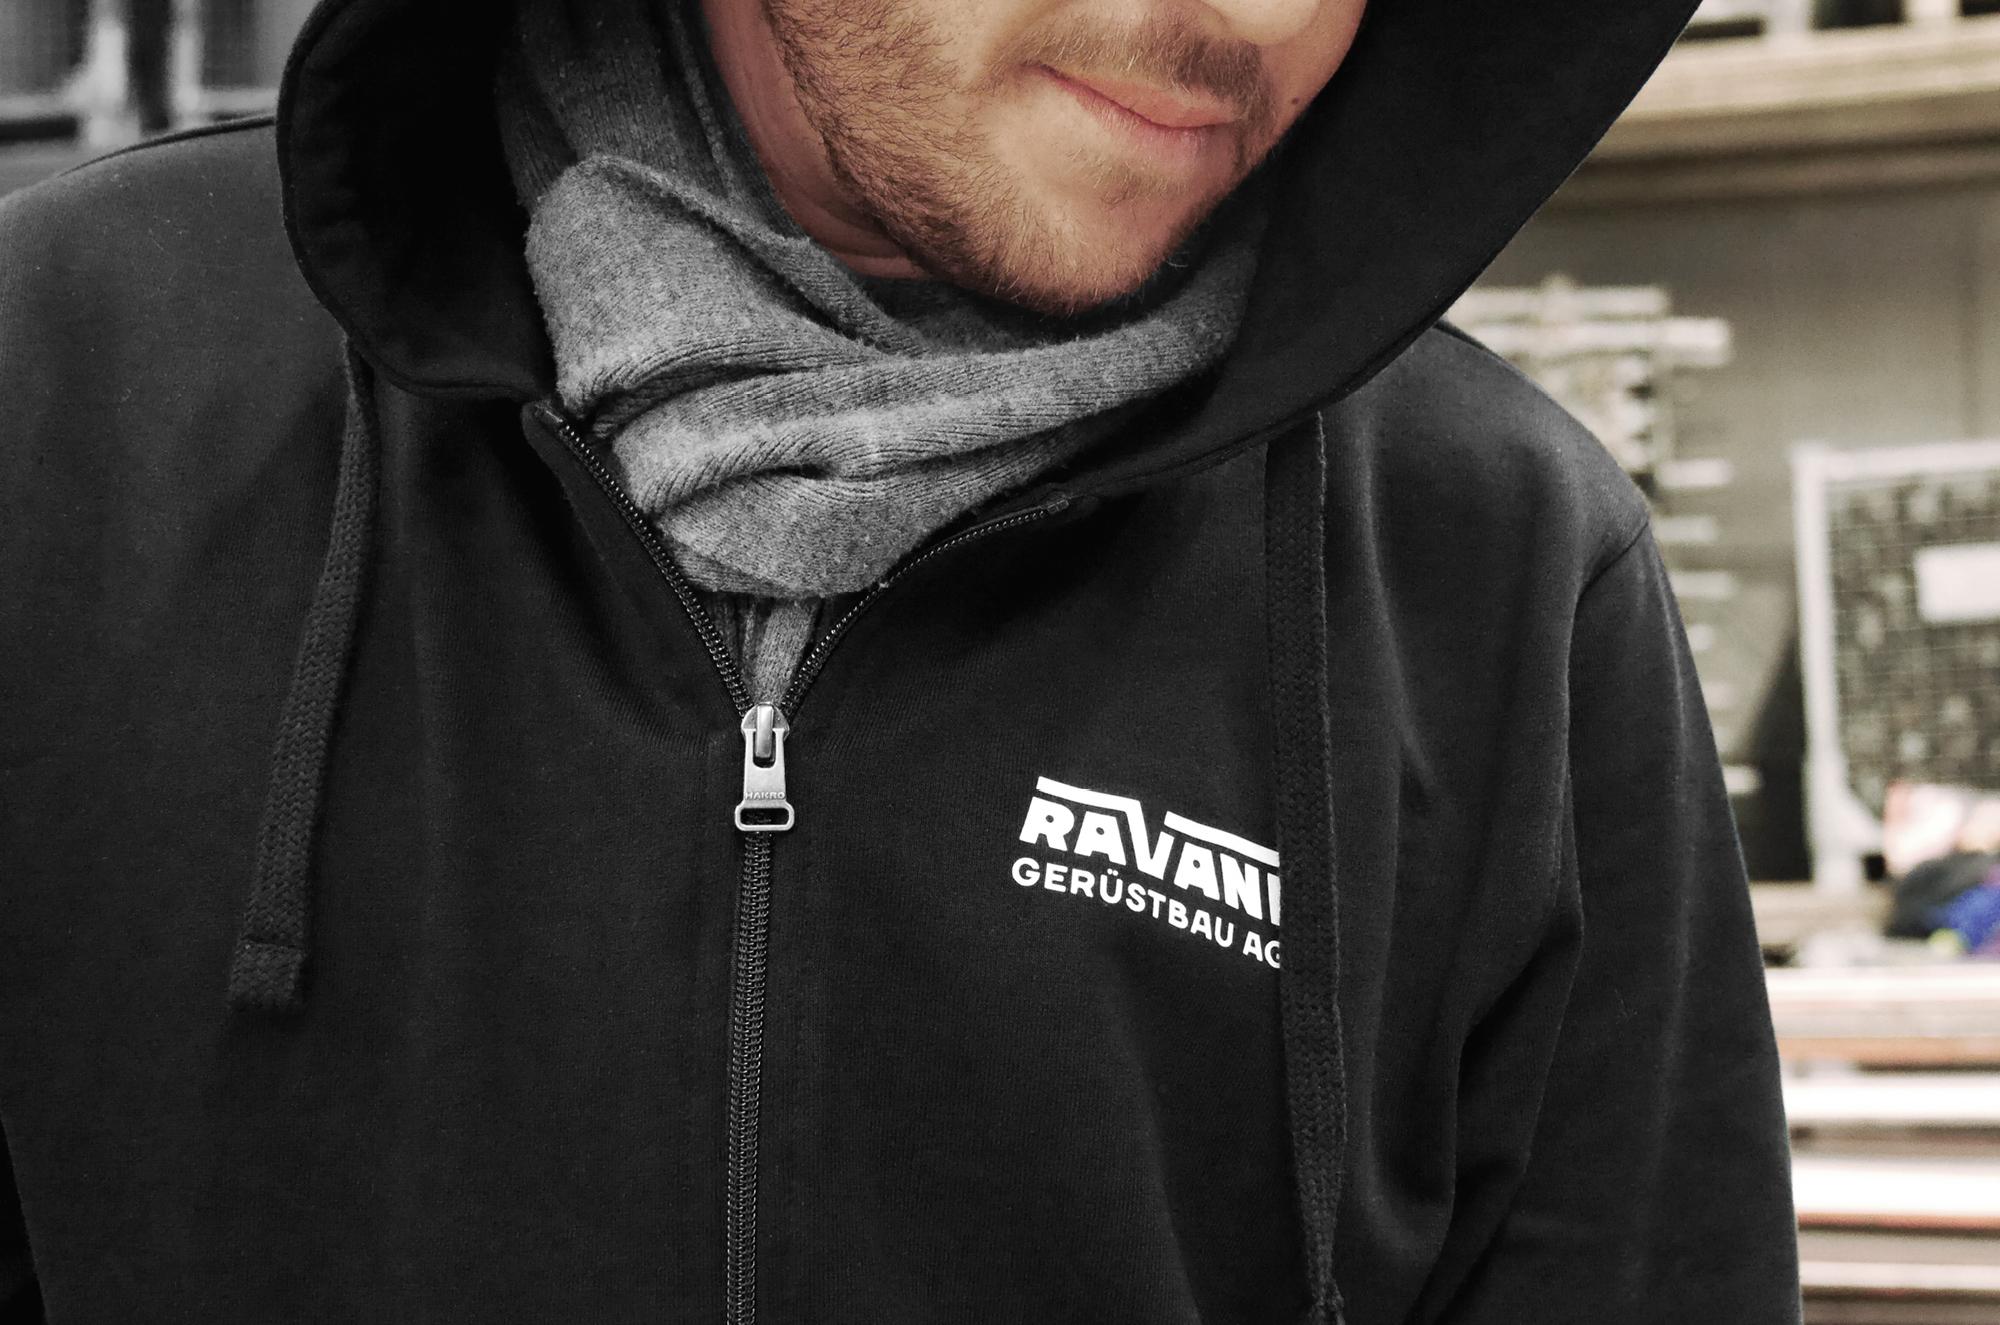 Ravani Gerüstbau AG